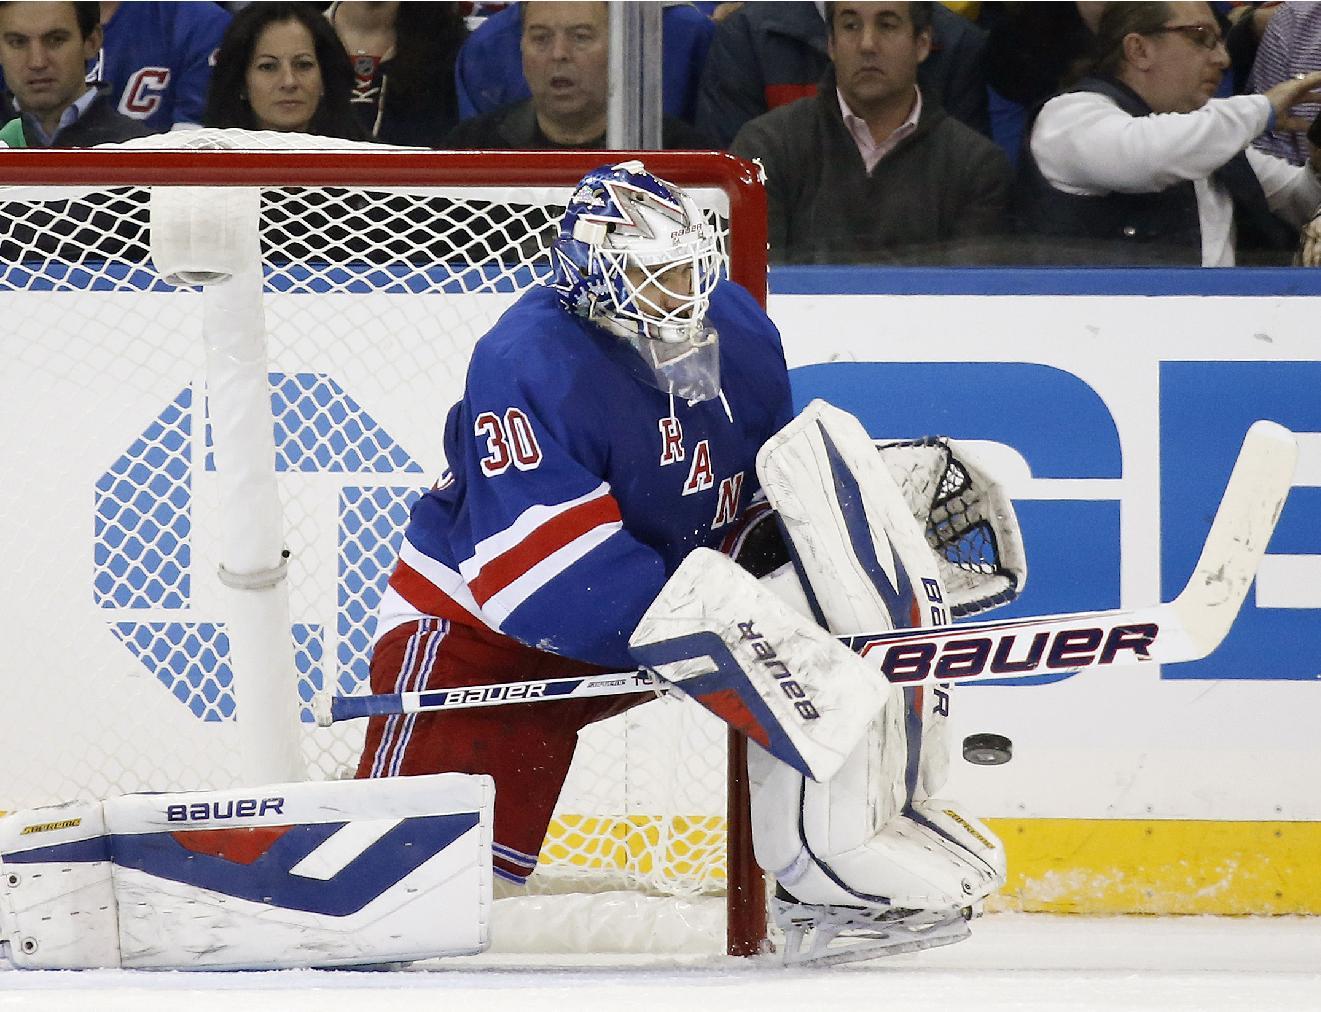 Montreal's Budaj, Plekanec spoil Rangers' opener